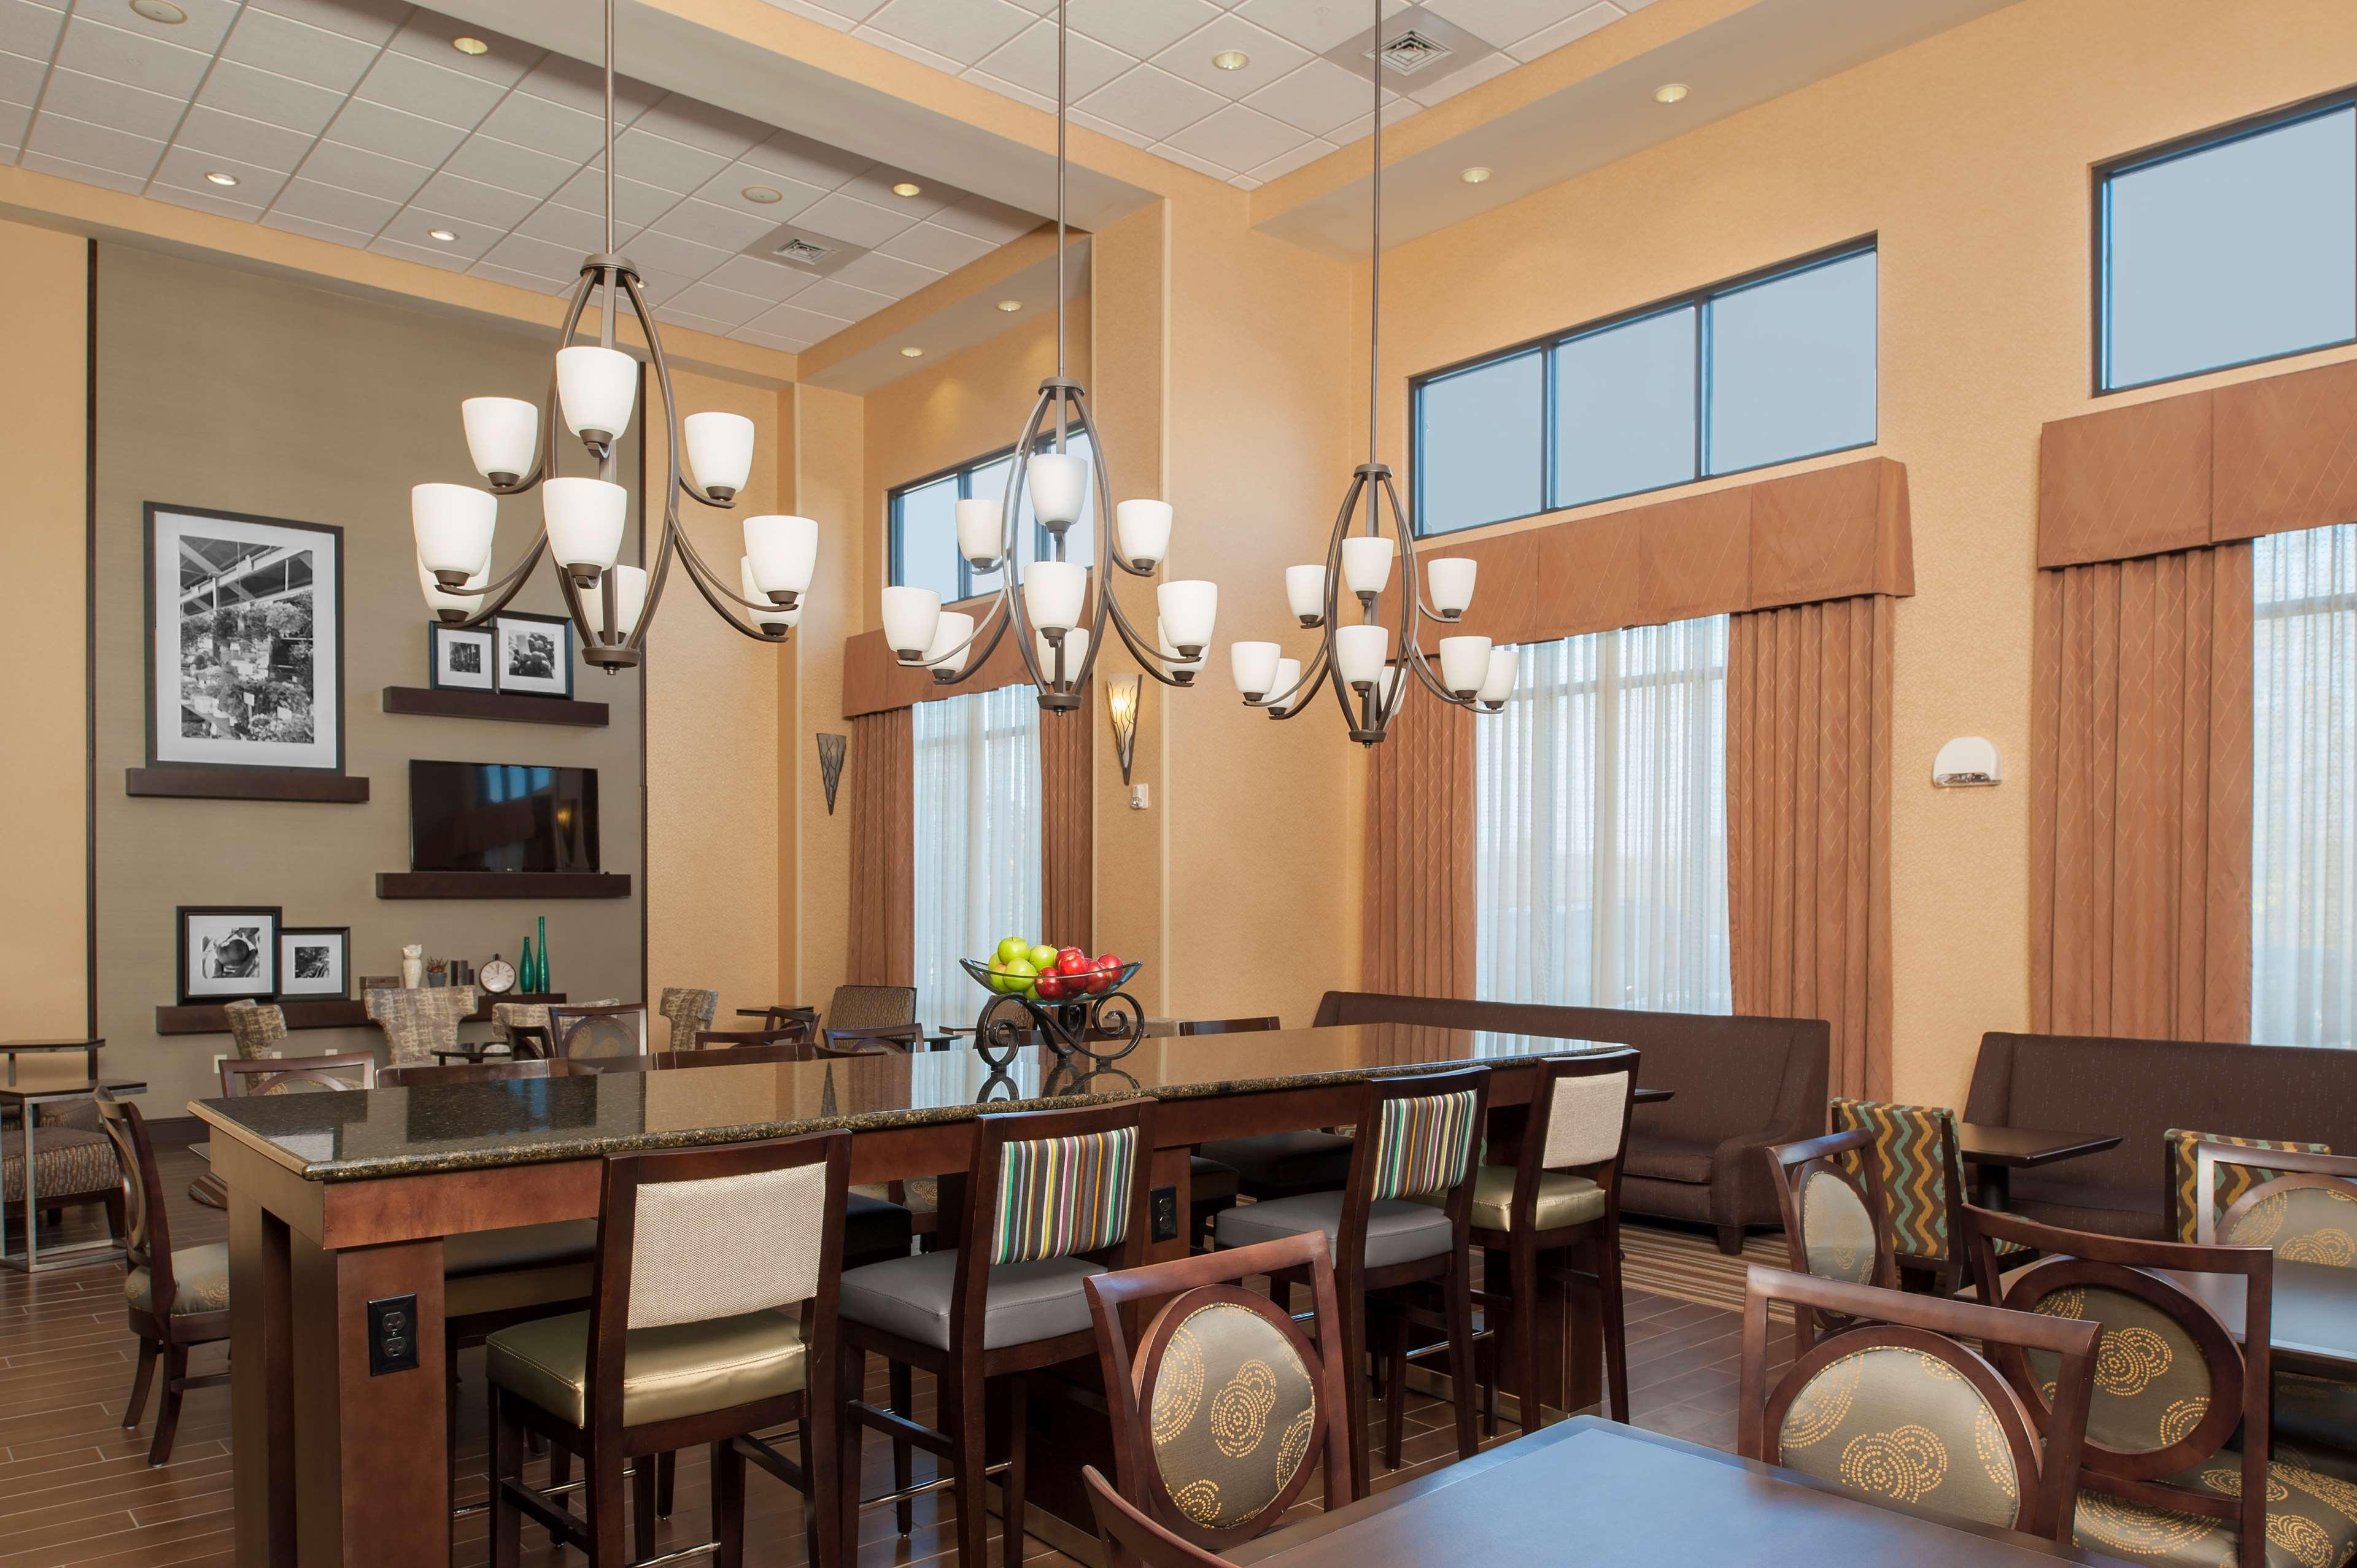 Hampton Inn & Suites Grand Rapids-Airport 28th St image 1